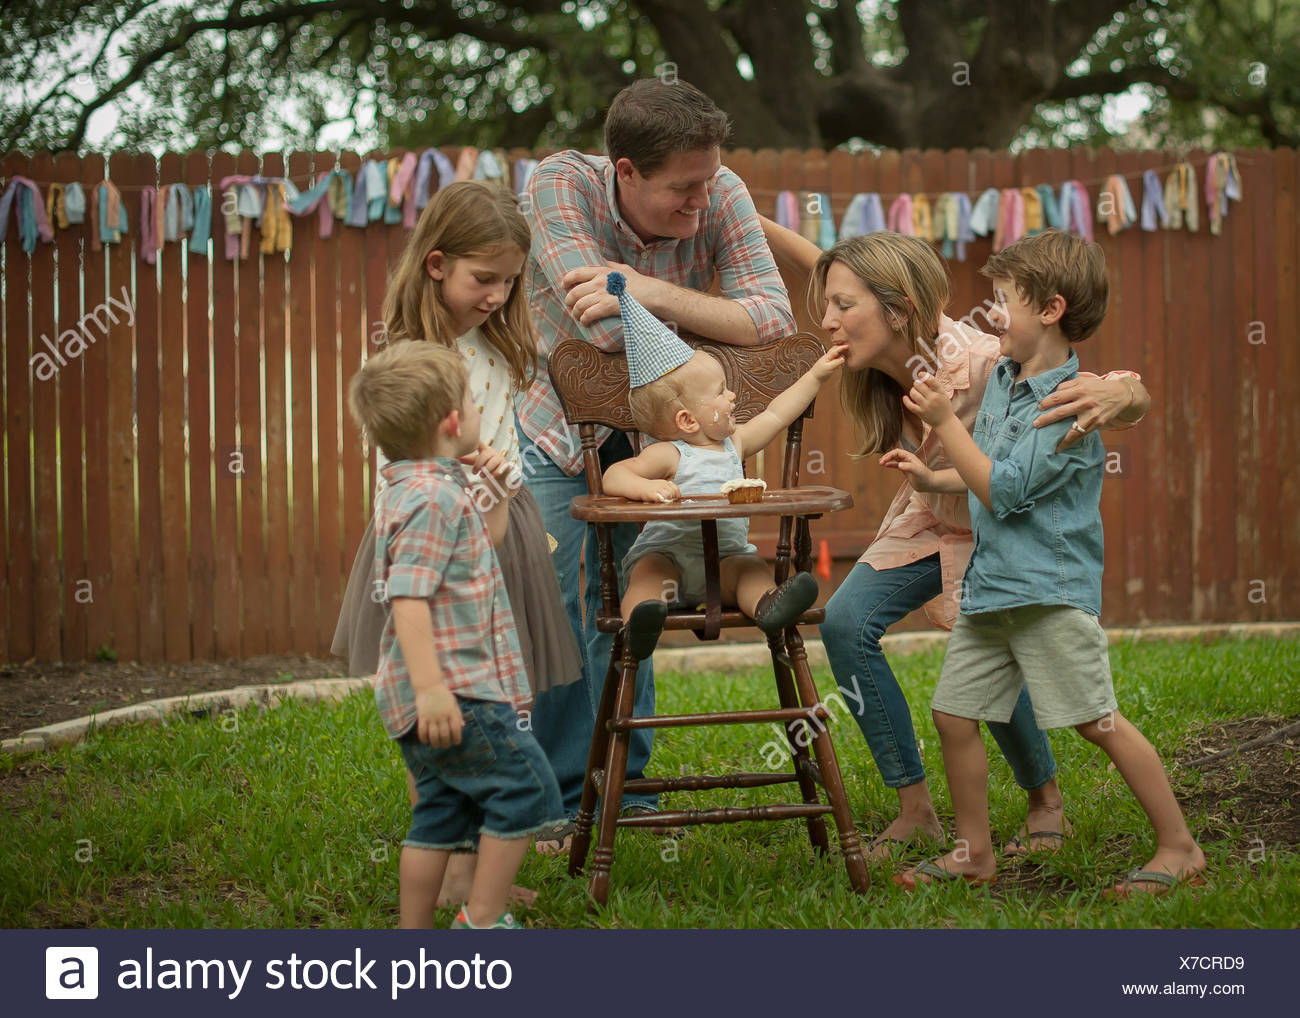 Familie feiert ersten Geburtstag Baby-jungen im Hinterhof Stockbild